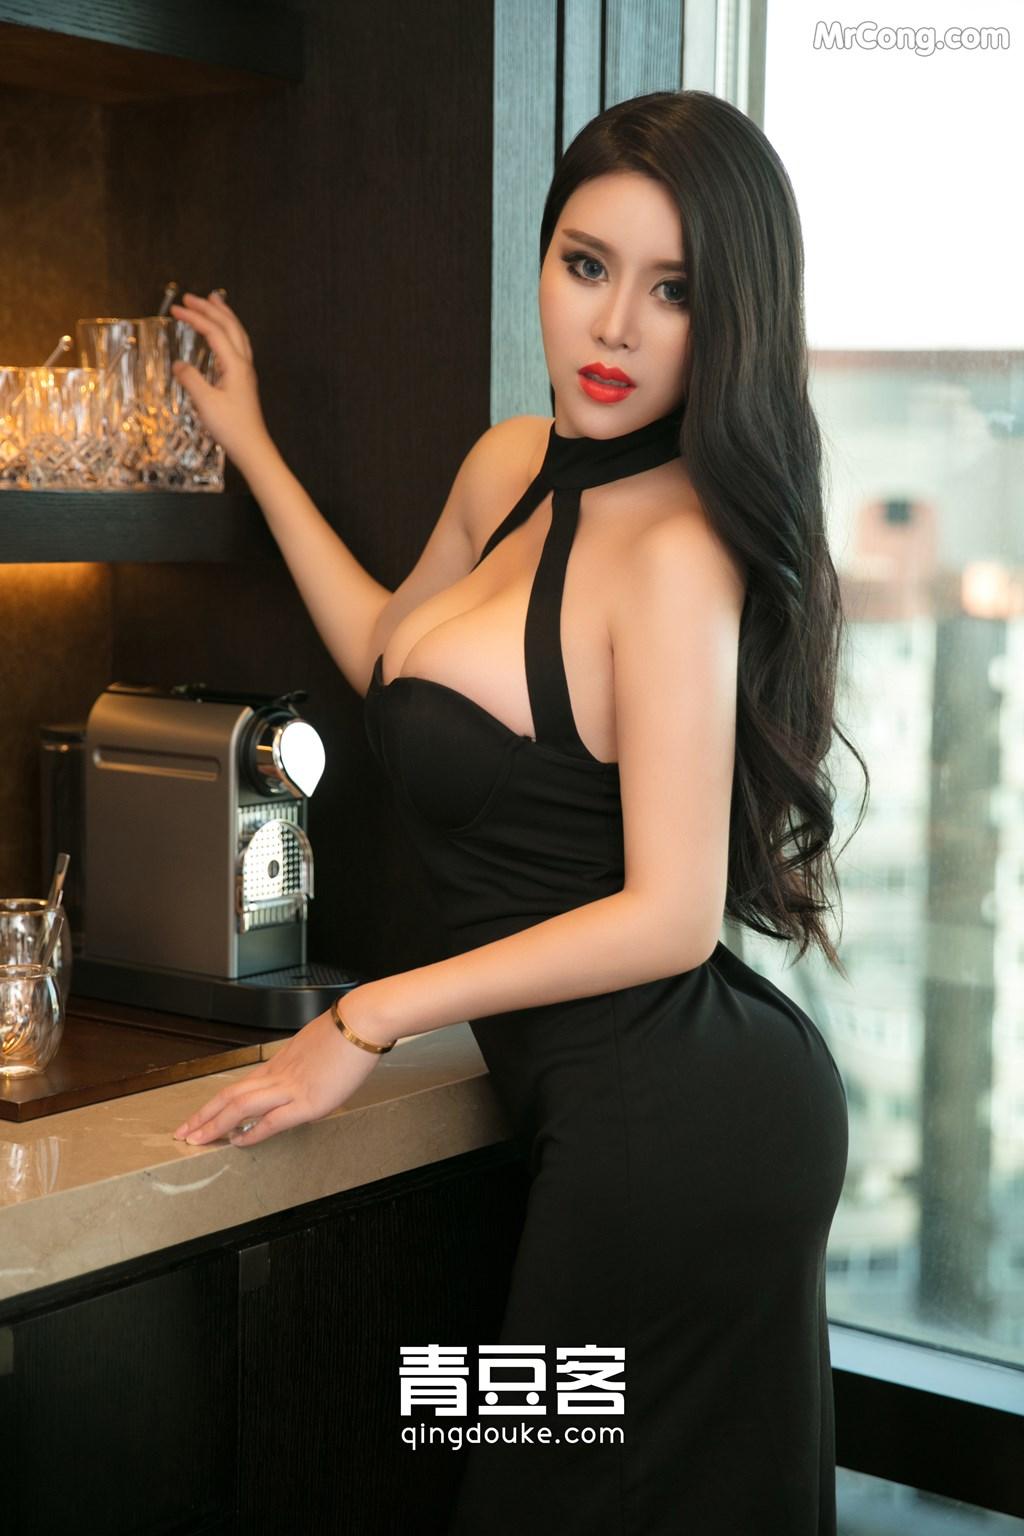 Image QingDouKe-2017-11-05-Ke-Rui-Na-MrCong.com-015 in post QingDouKe 2017-11-05: Người mẫu Ke Rui Na (可蕊娜) (48 ảnh)